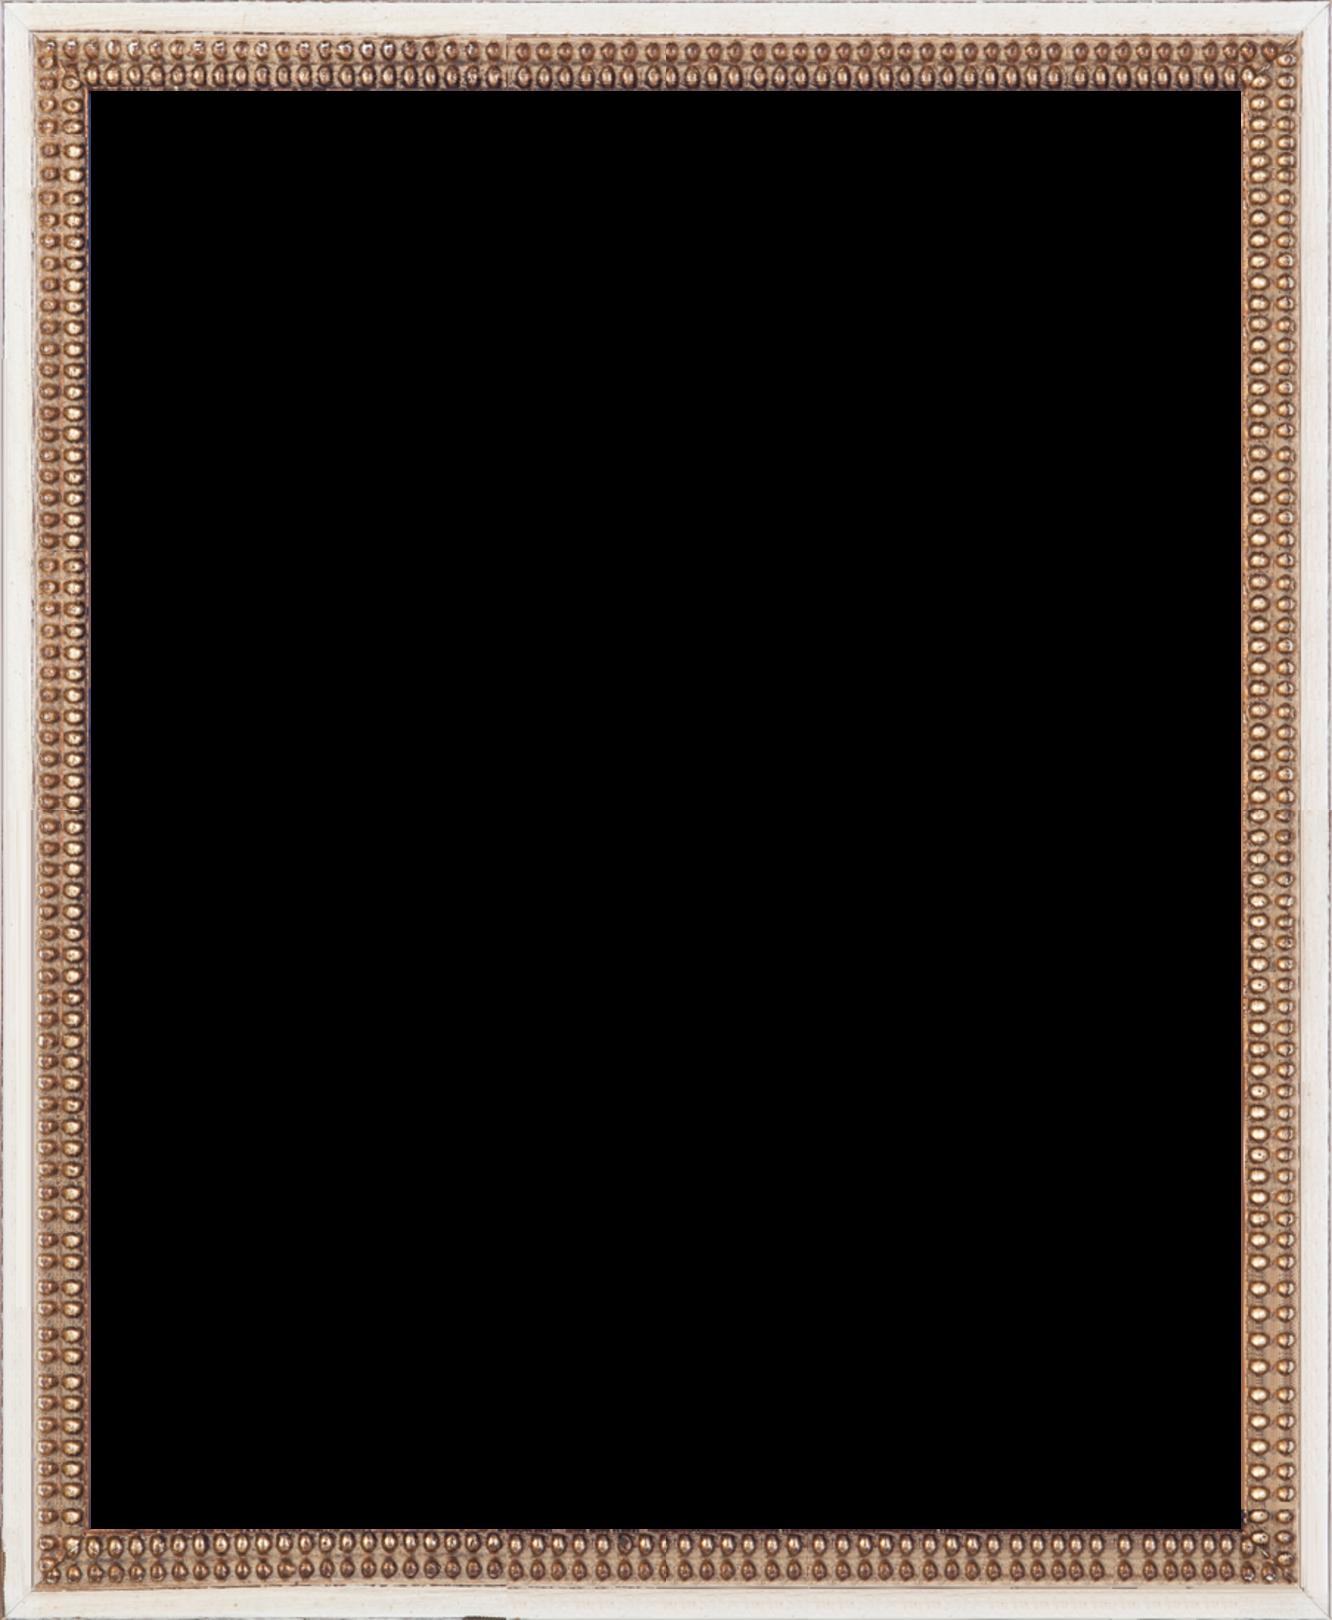 820-1426661656